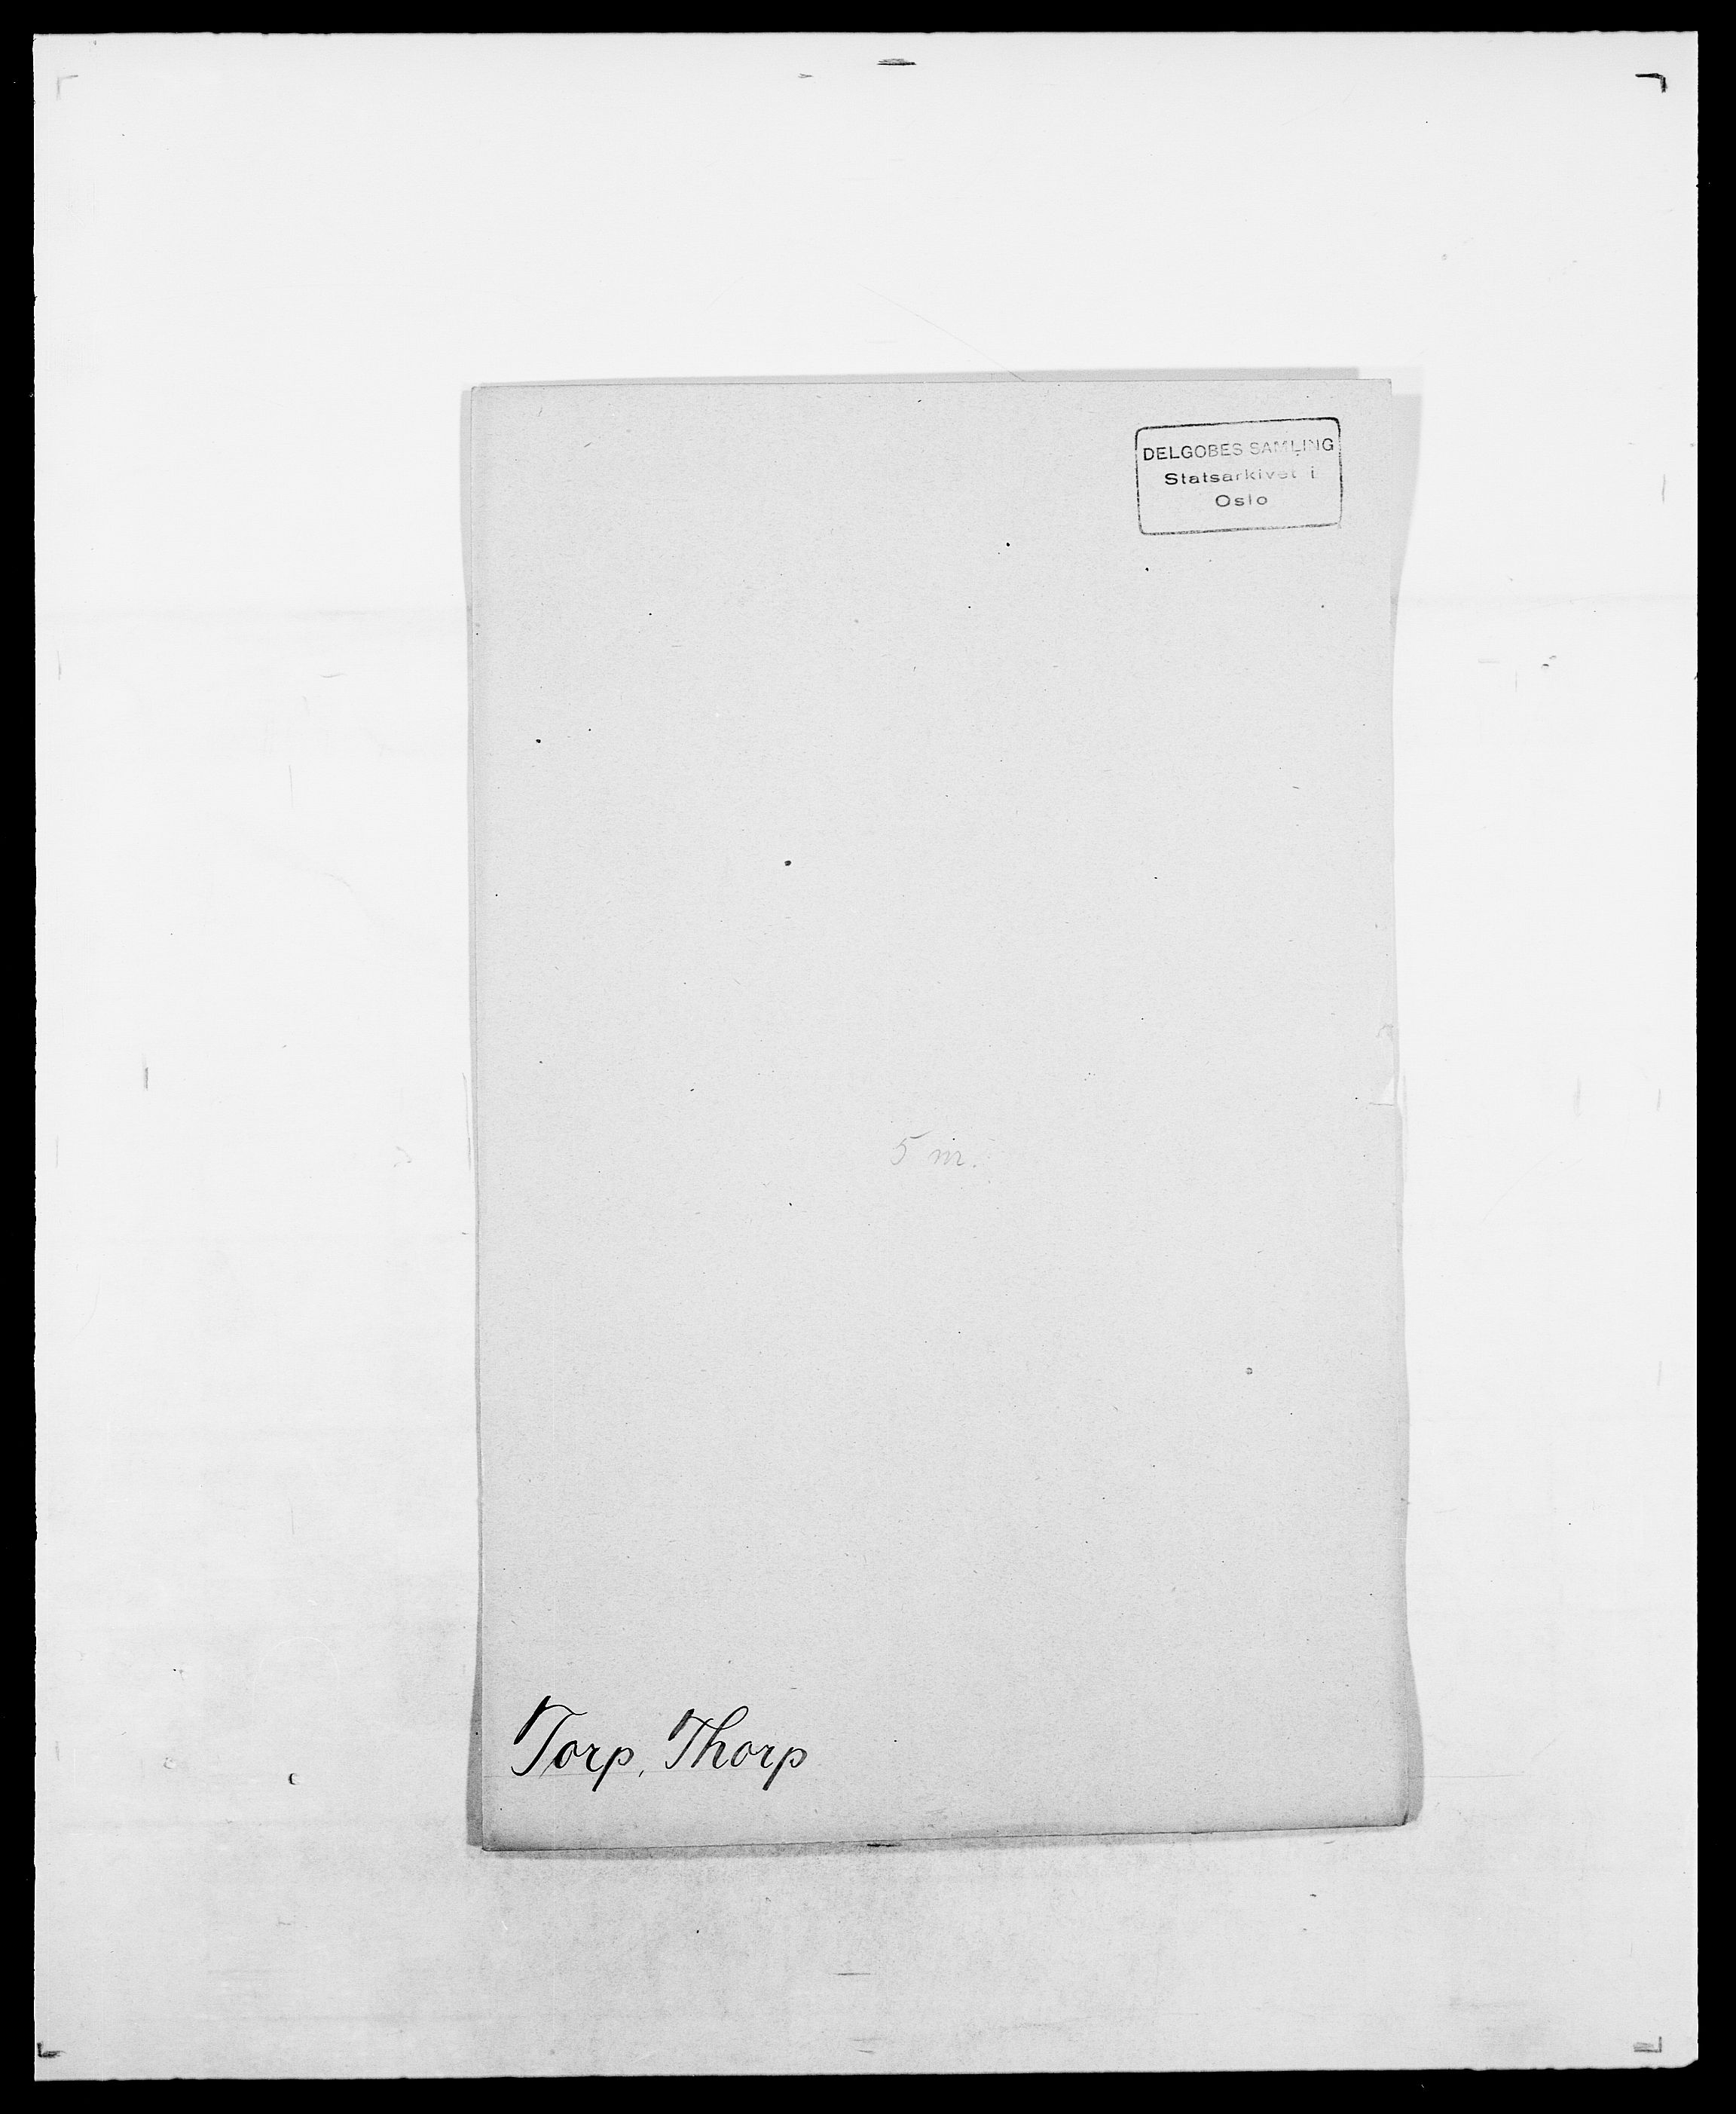 SAO, Delgobe, Charles Antoine - samling, D/Da/L0039: Thorsen - Urup, s. 247